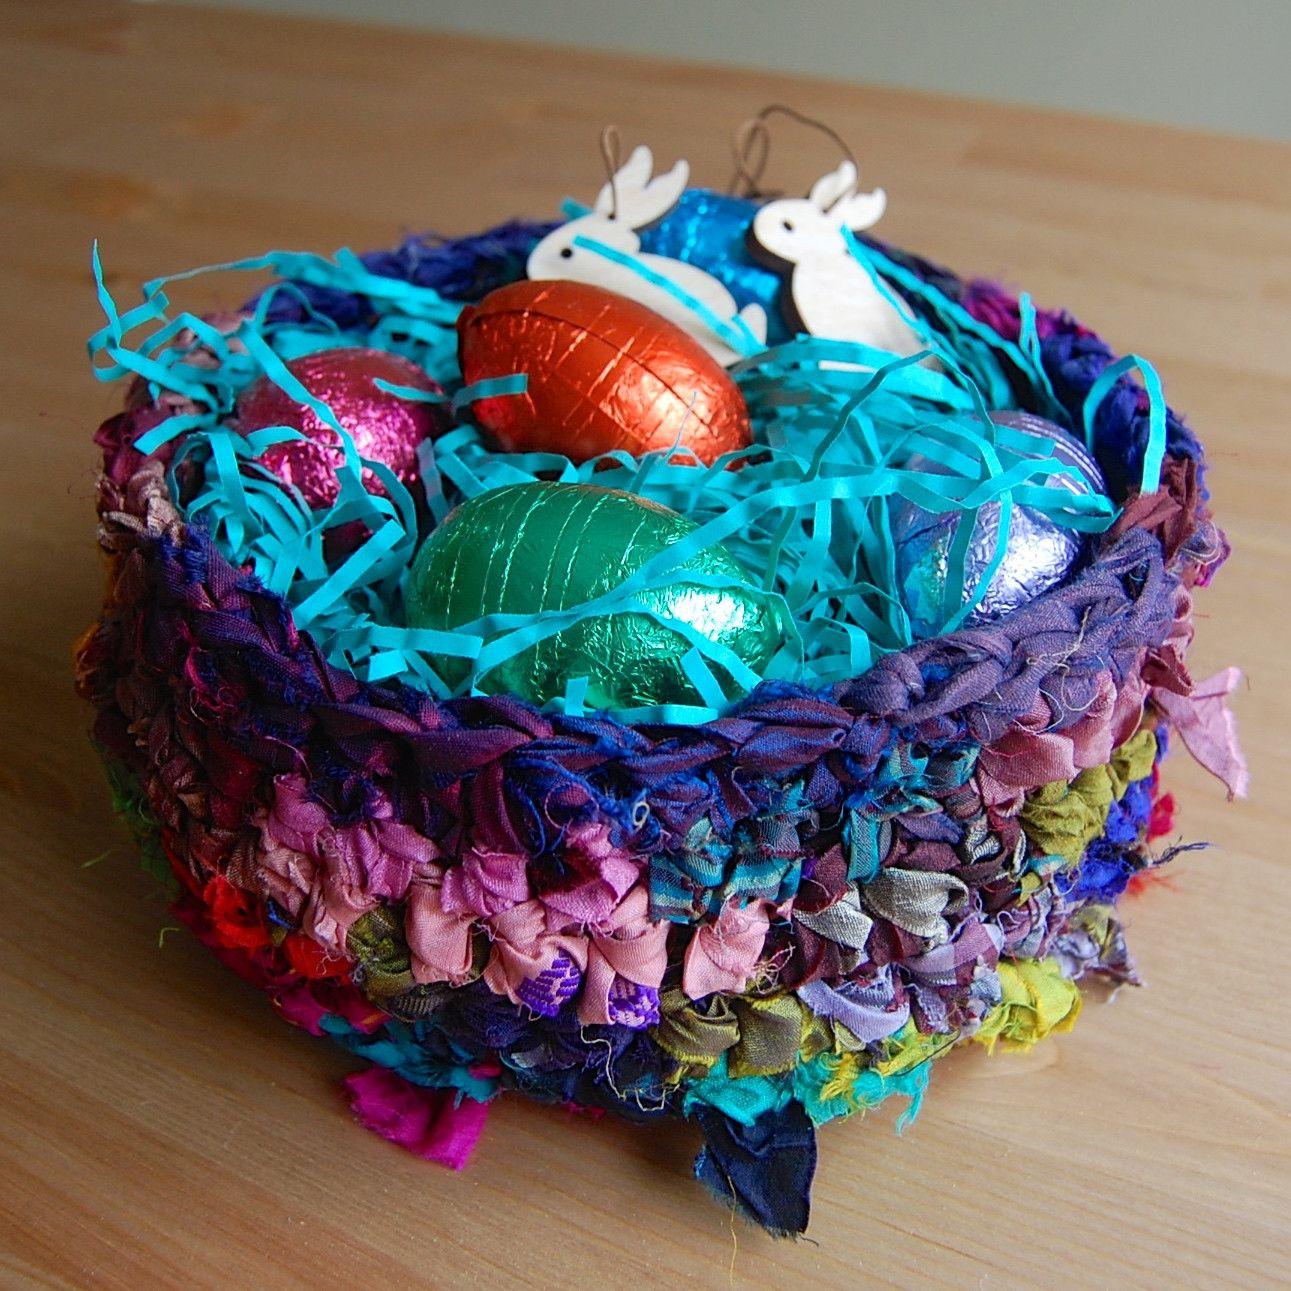 Crochet Sari Ribbon Nesting Basket Free Pattern - makes a great ...